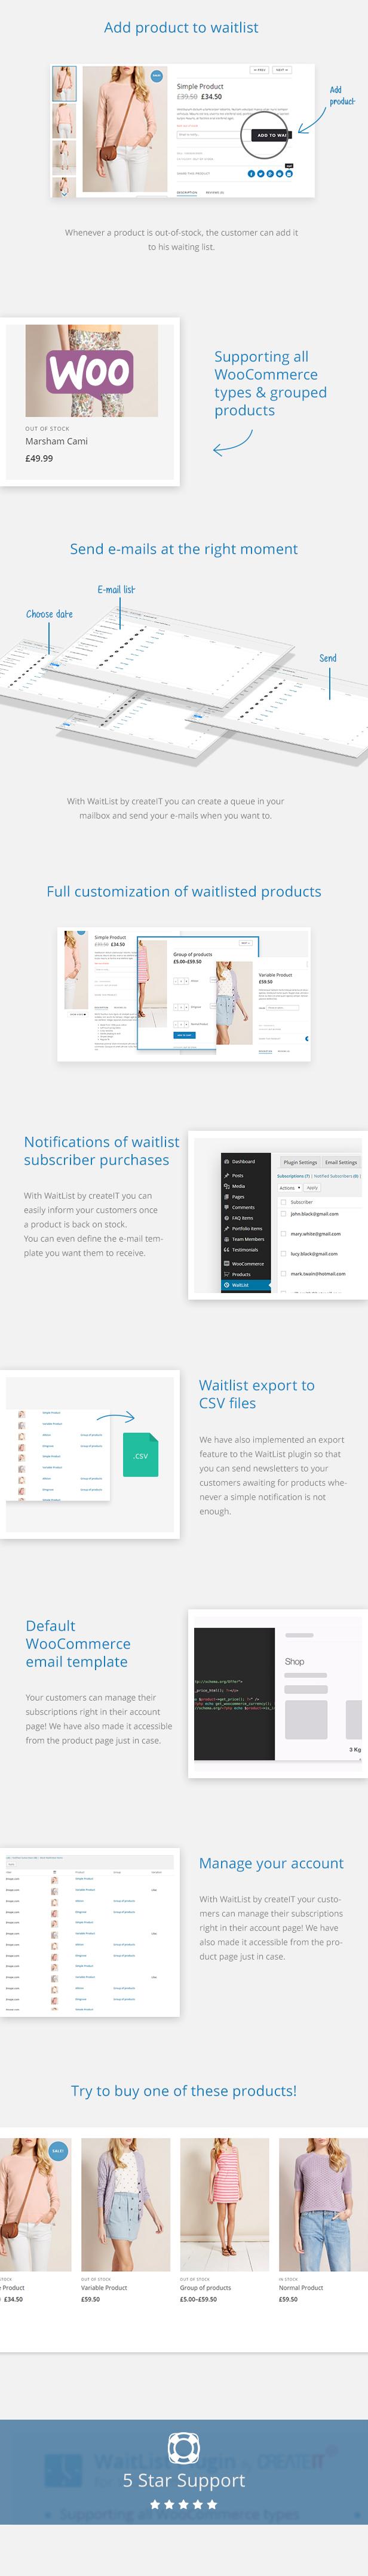 Waitlist for WooCommerce - Back In Stock Notifier - 8